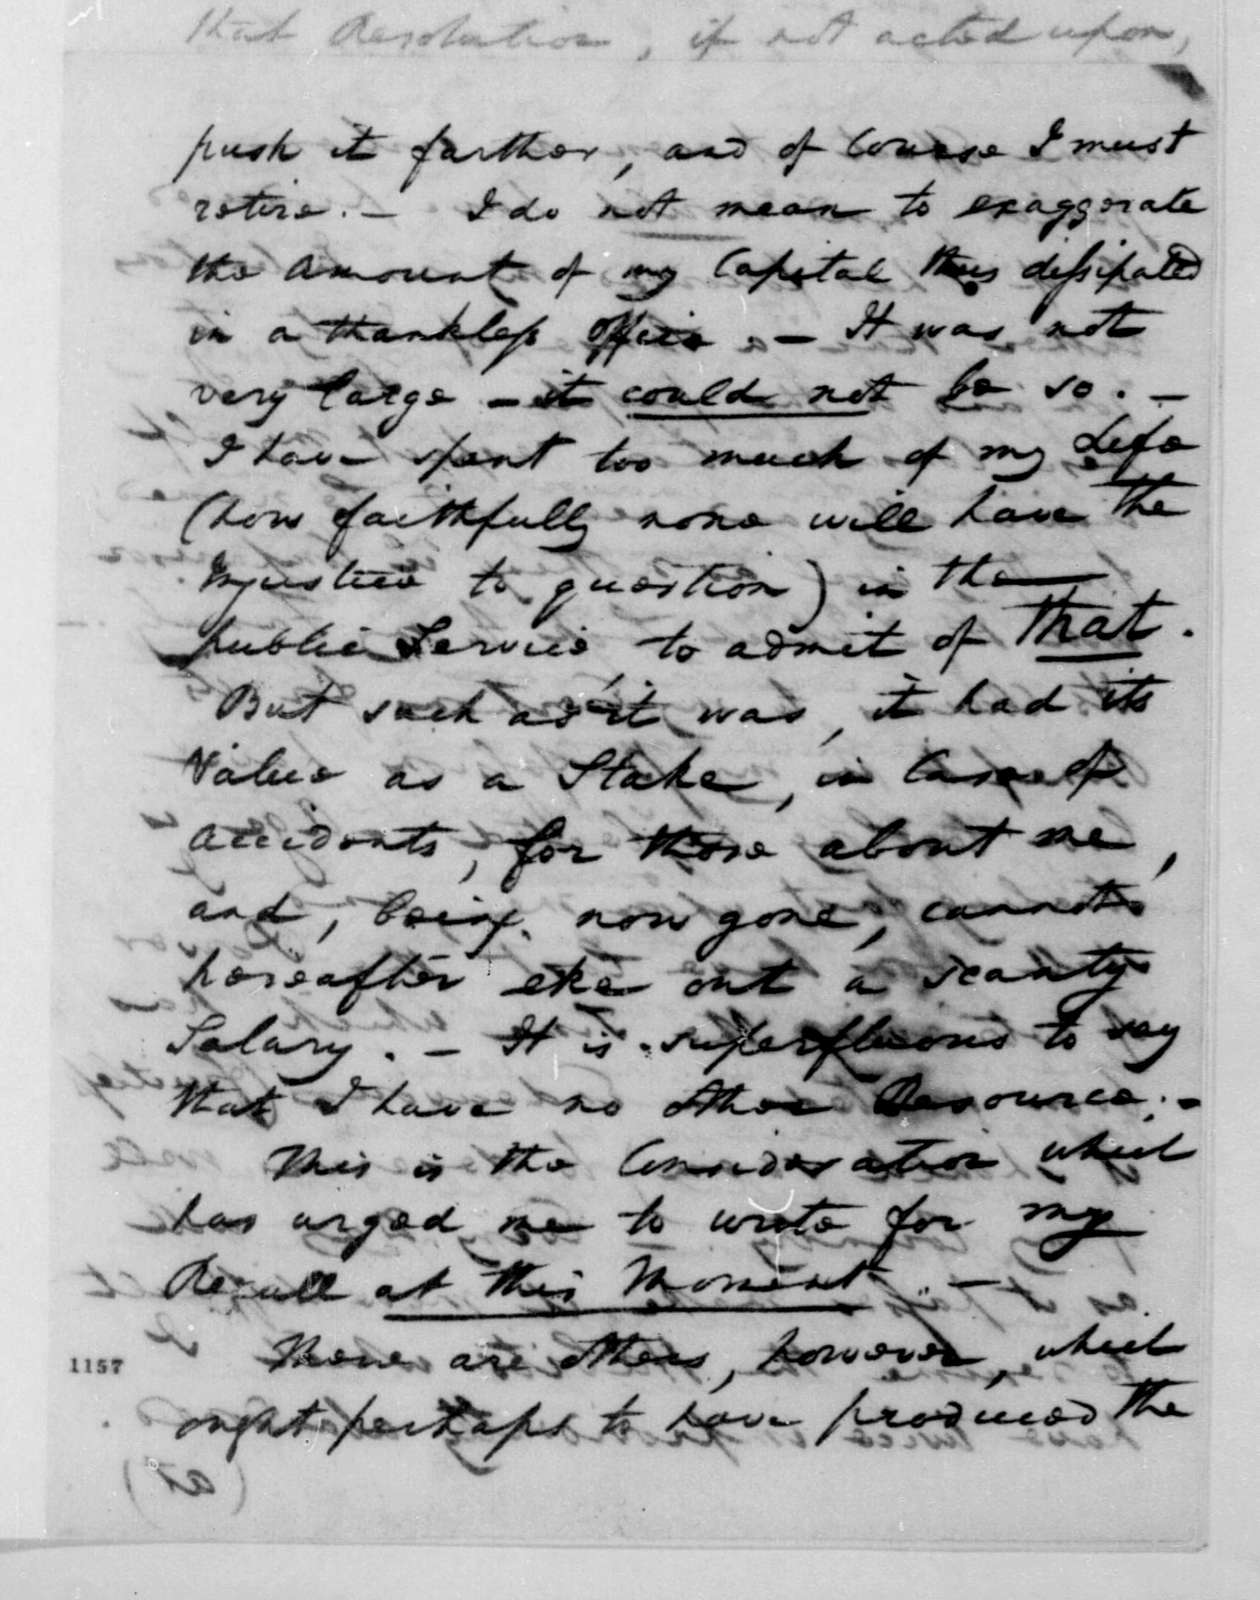 William Pinkney to James Madison, November 24, 1810.